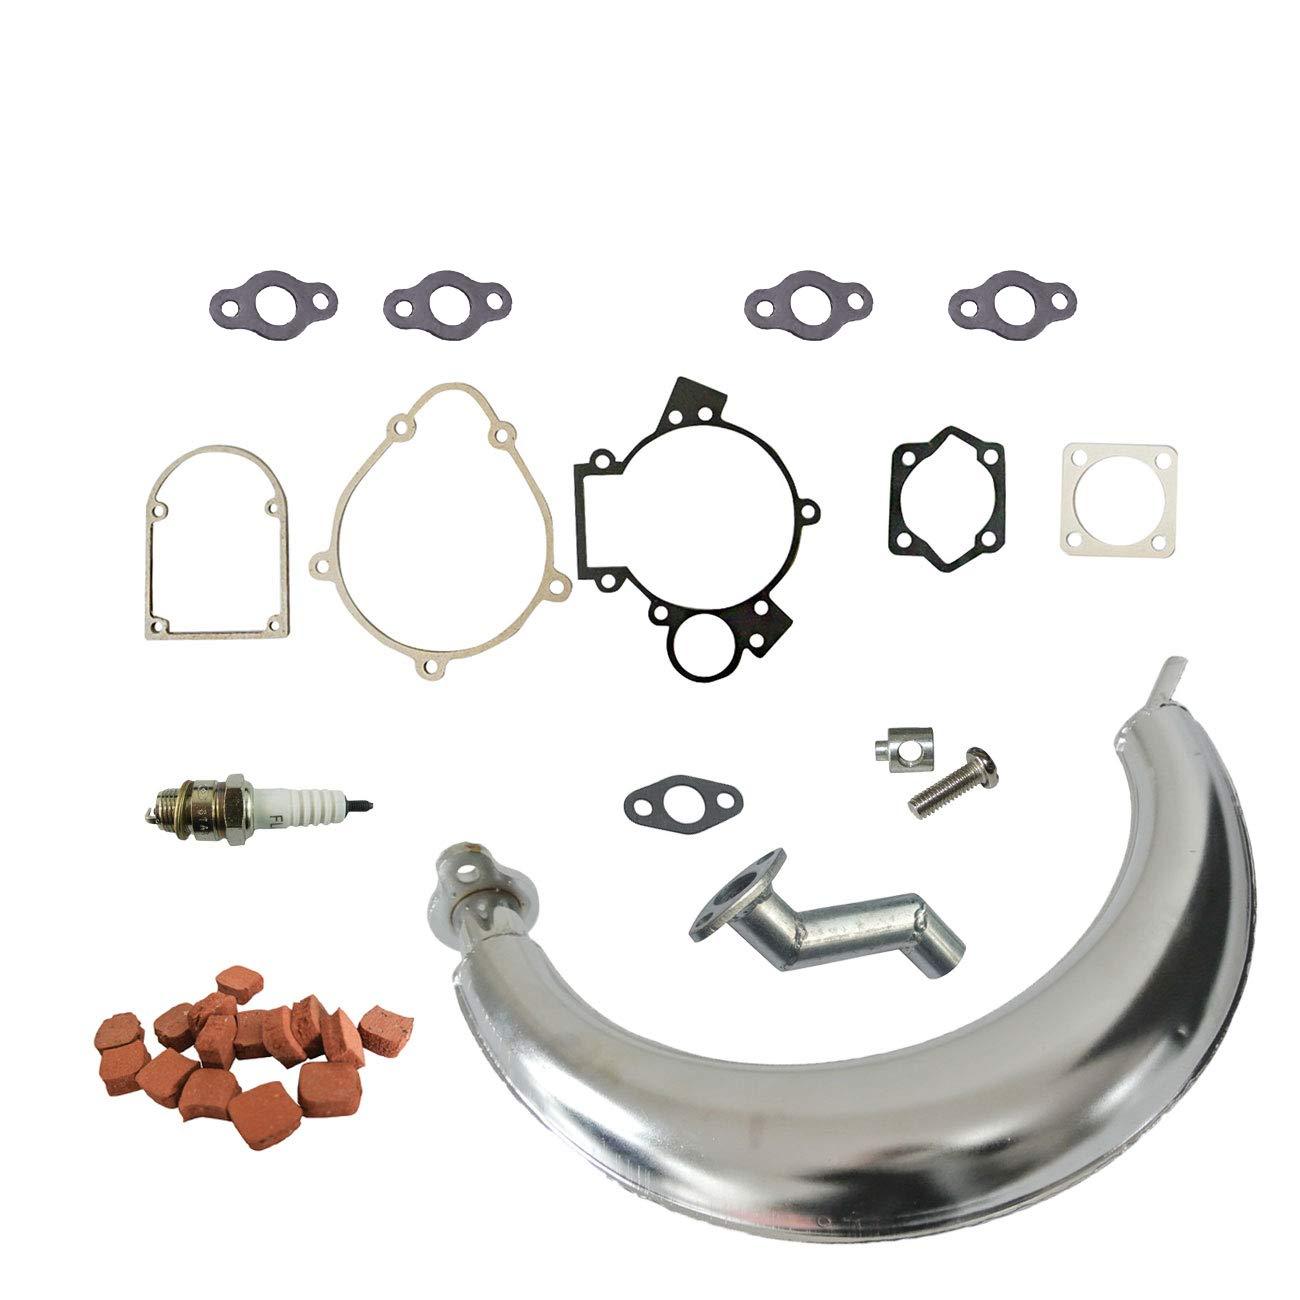 sthus Muffler Exhaust/&15pcs Square Clutch Pads for 66cc 80cc Engine Motorized Bike